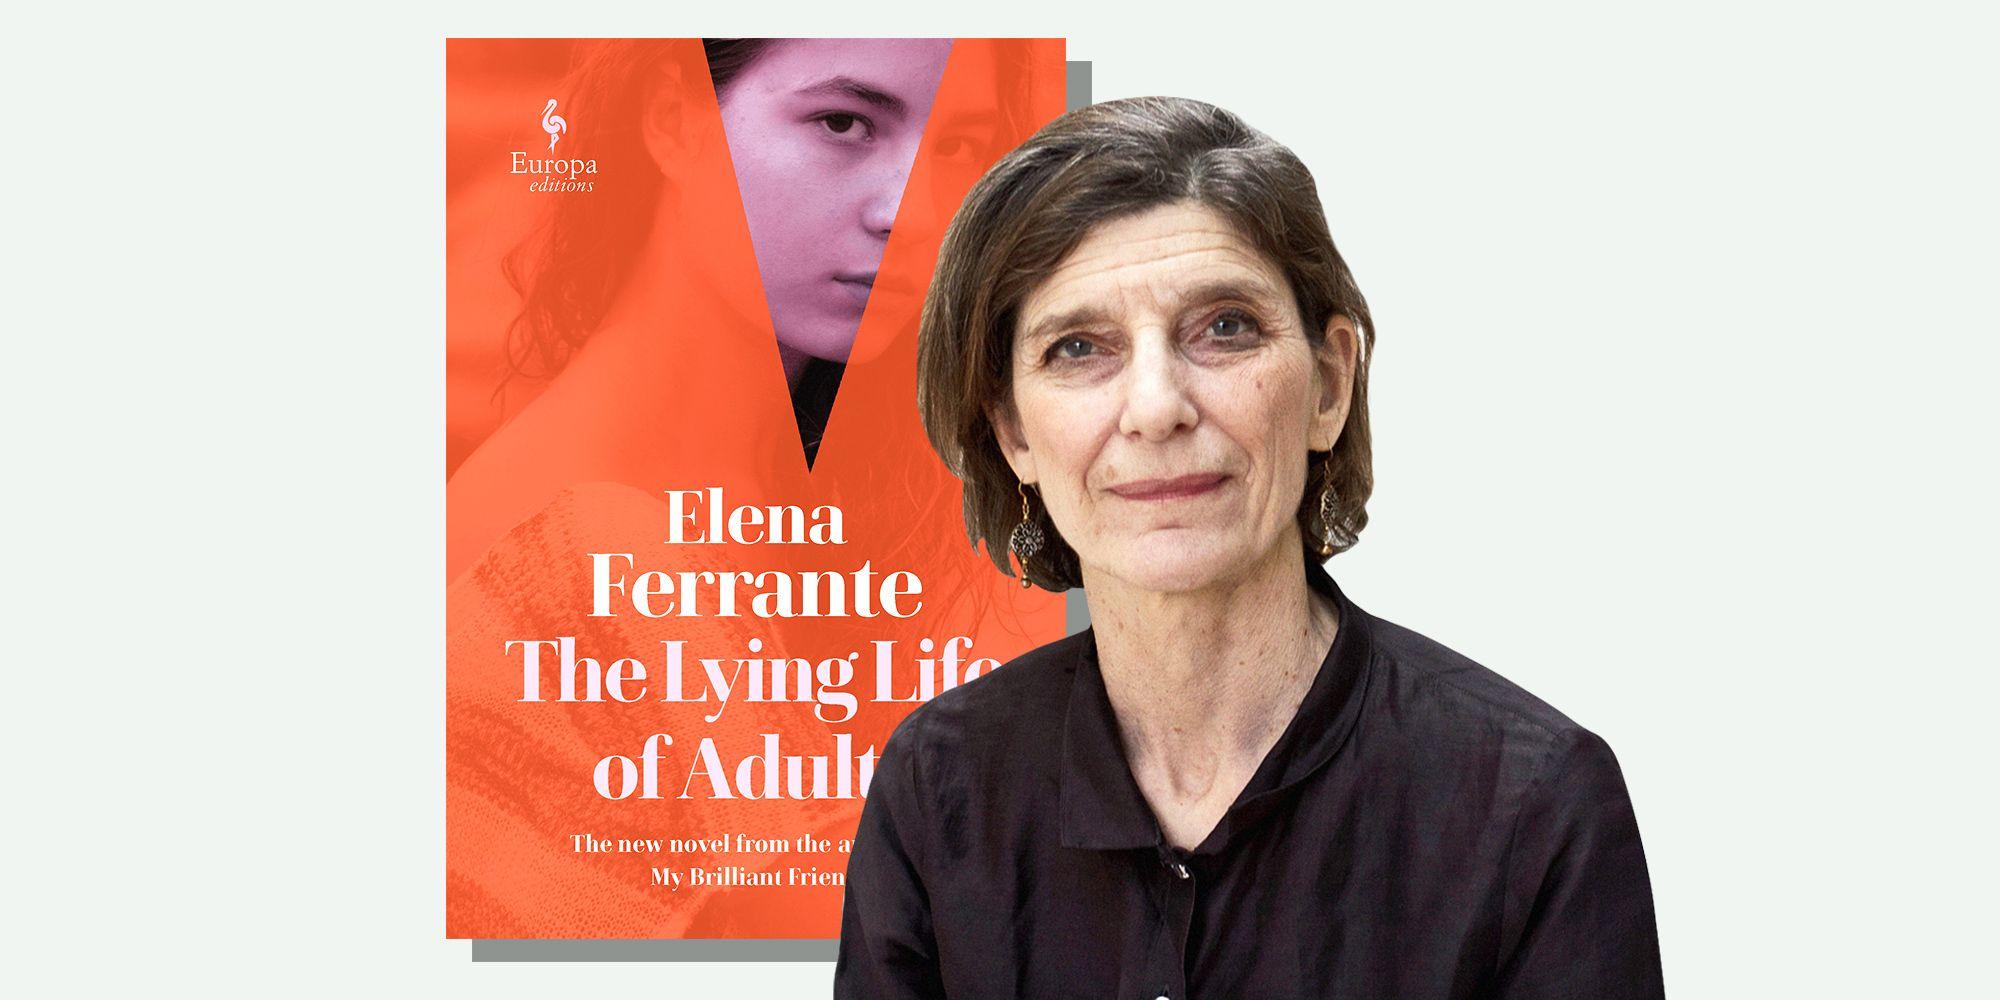 The Complete Collection of Elena Ferrante